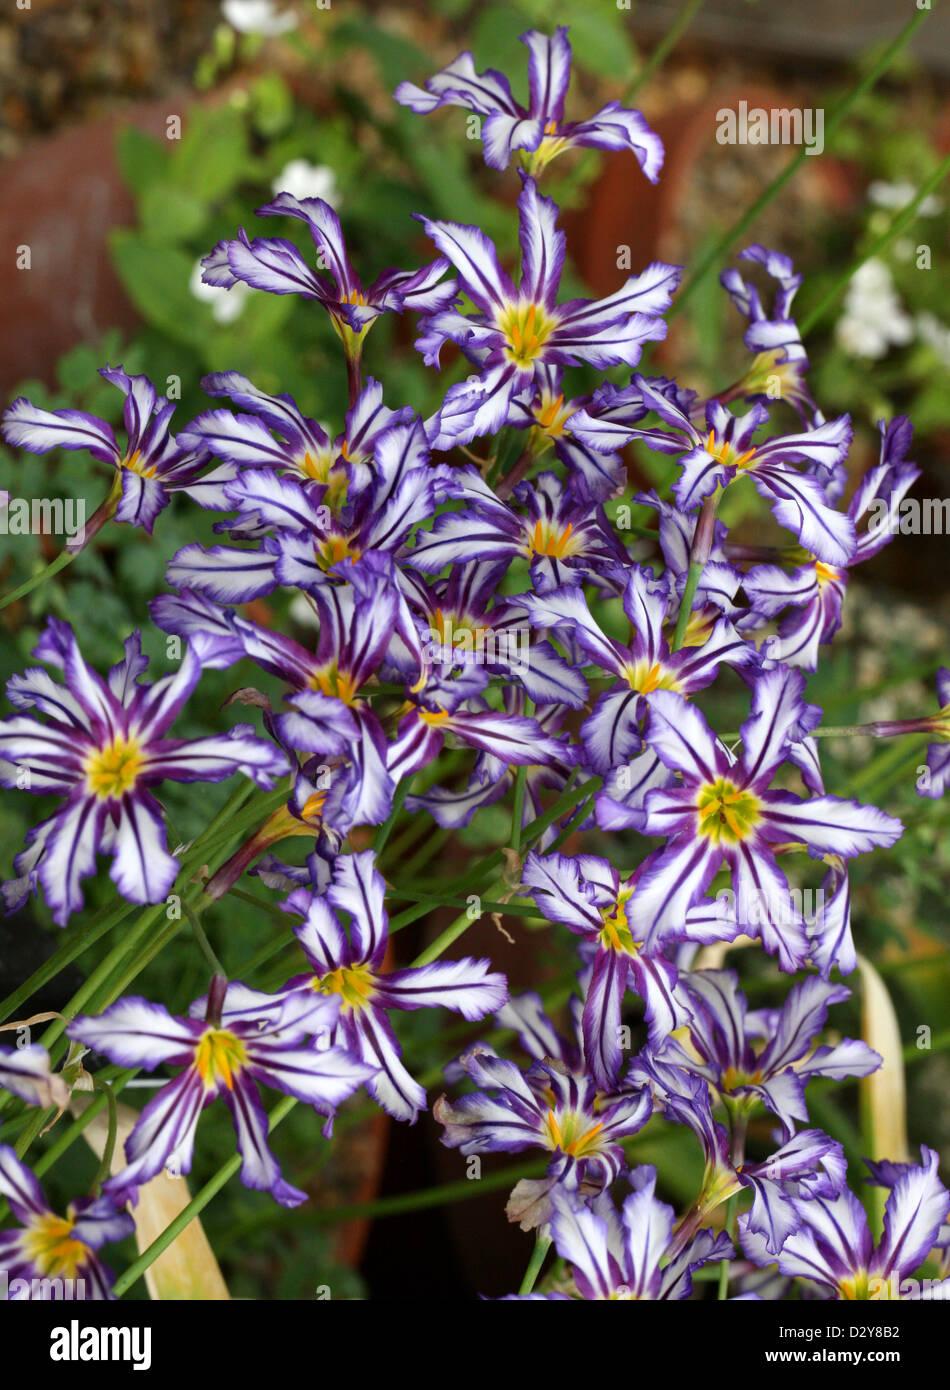 Glory of the Sun, Leucocoryne pauciflora, Alliaceae. Chile, South America. - Stock Image